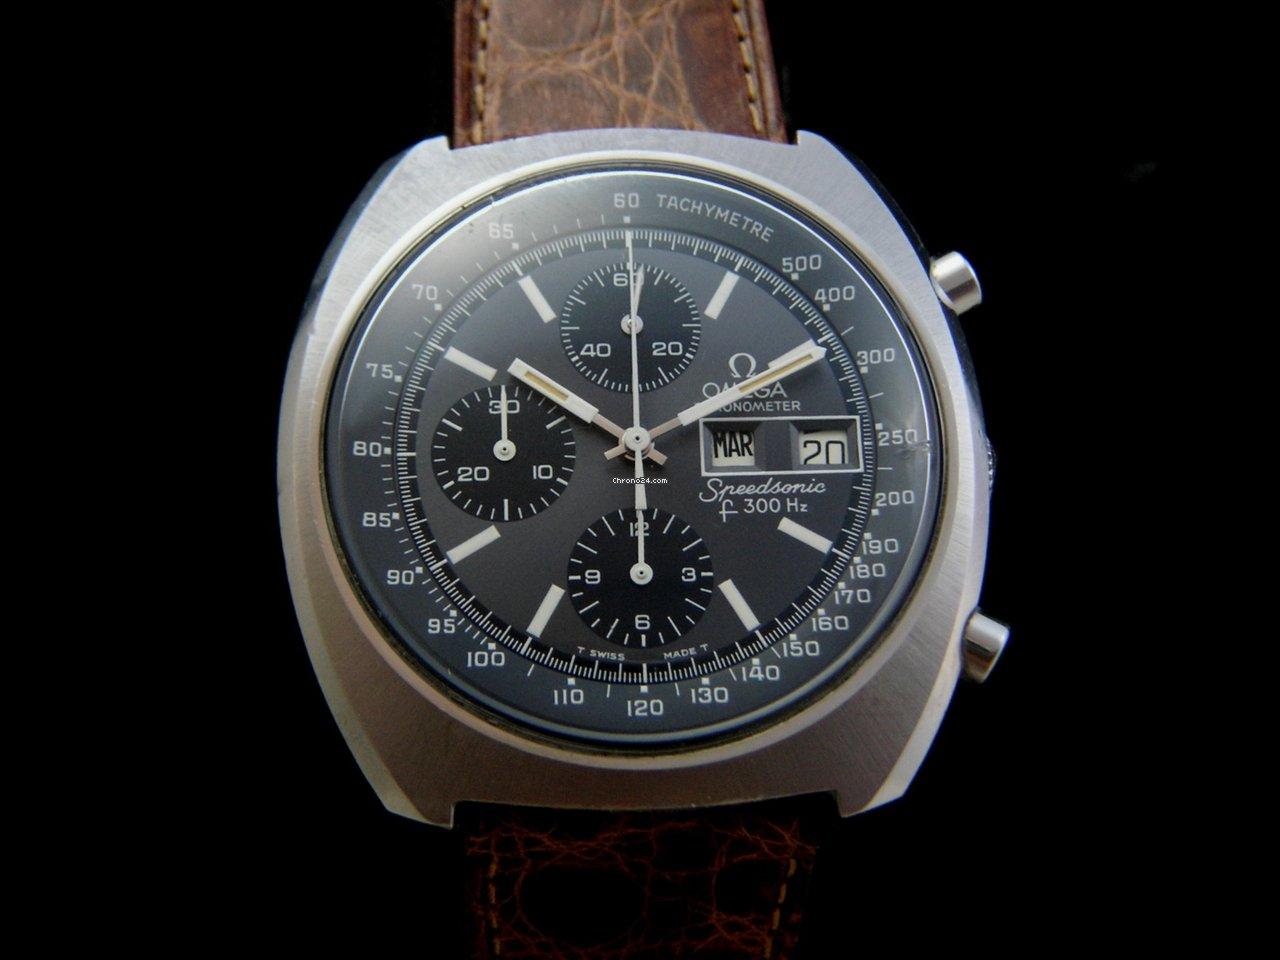 Omega Speedsonic Chronometer Chronograph Sold On Chrono24